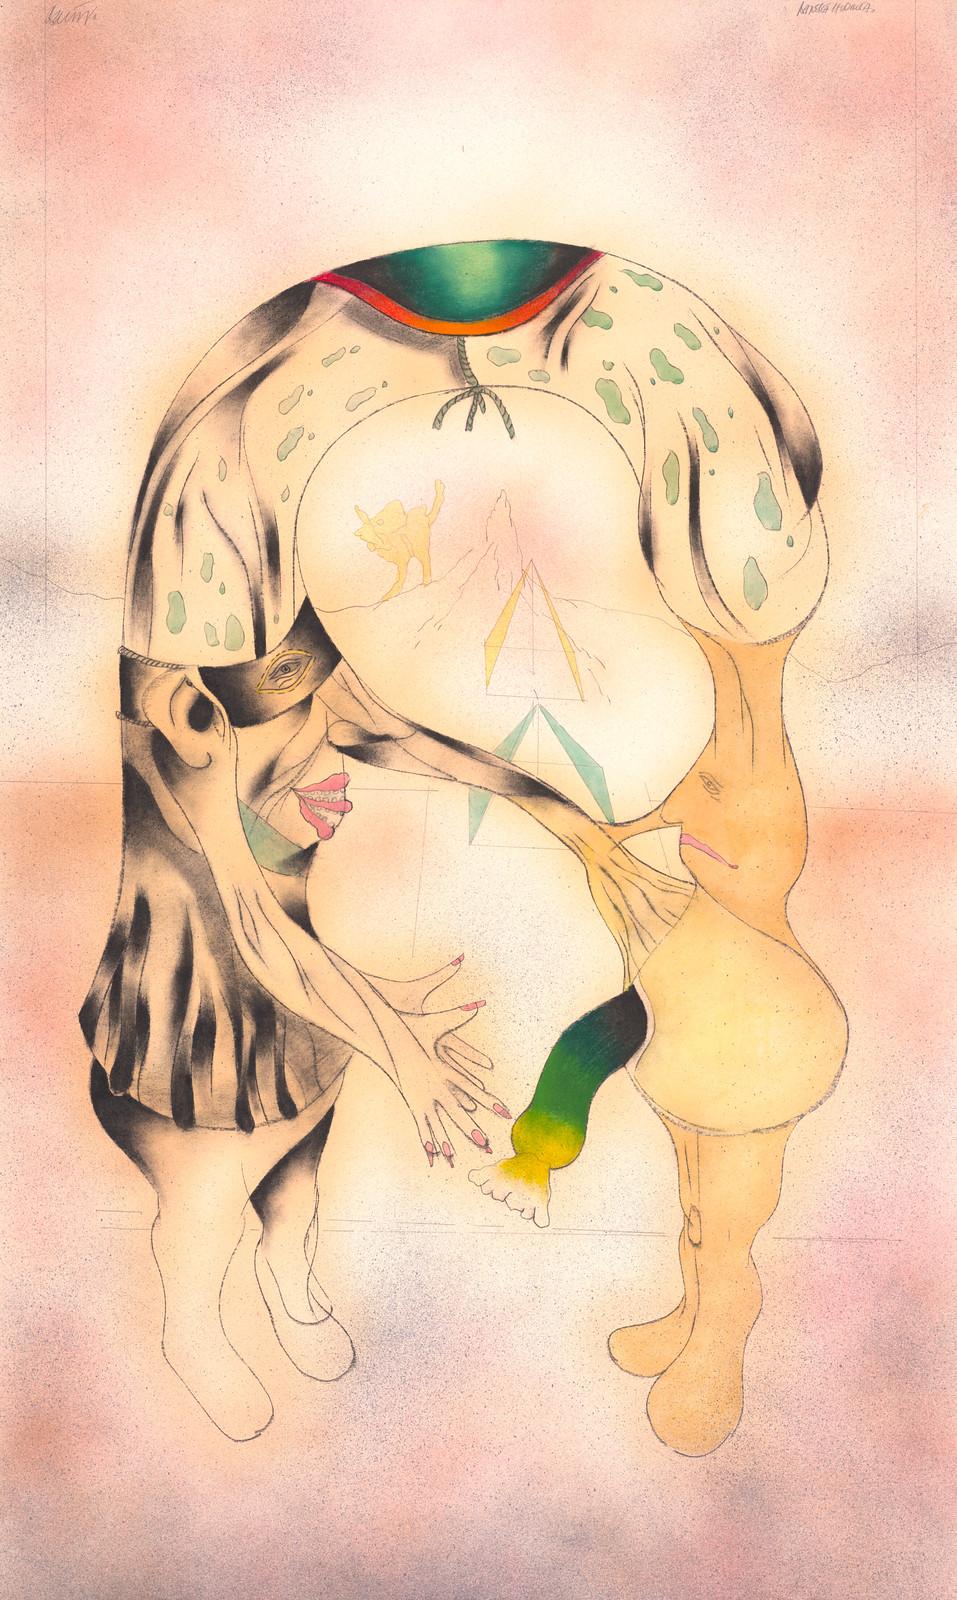 Karol Baron - Brutality & Cynicism Of Life Fantasy, 2, 1990-2000